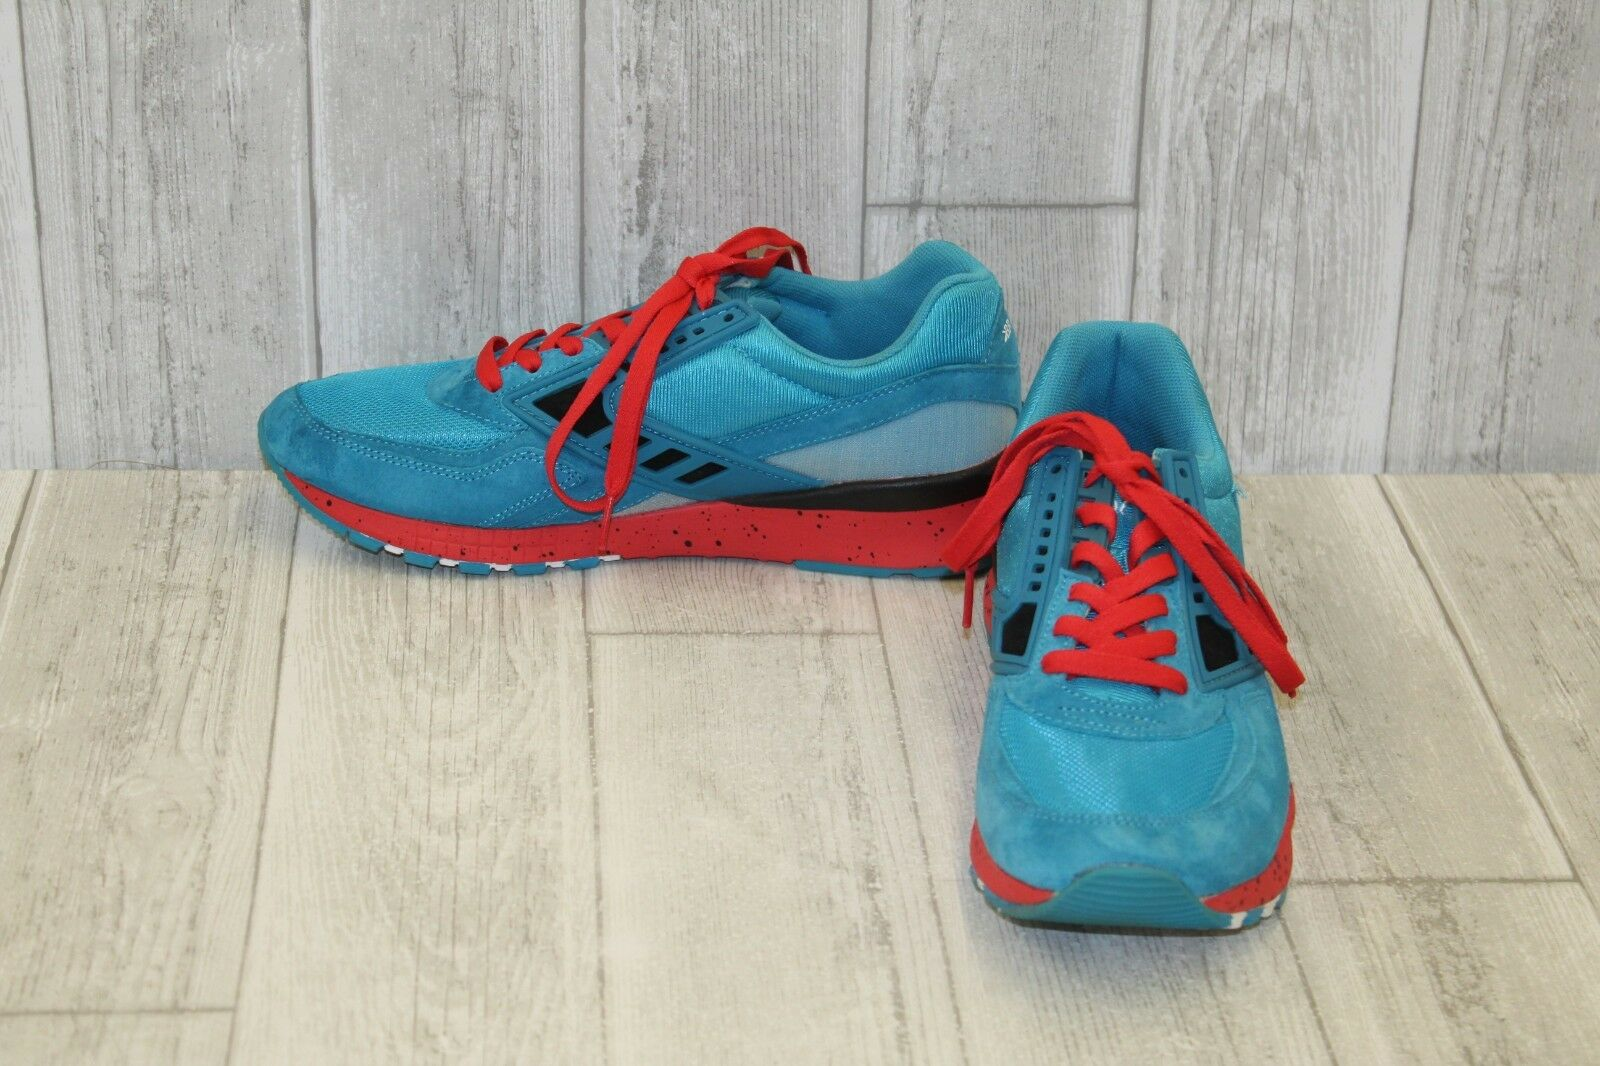 Brooks Regent Running Sneaker - Men's Size 8.5D bluee